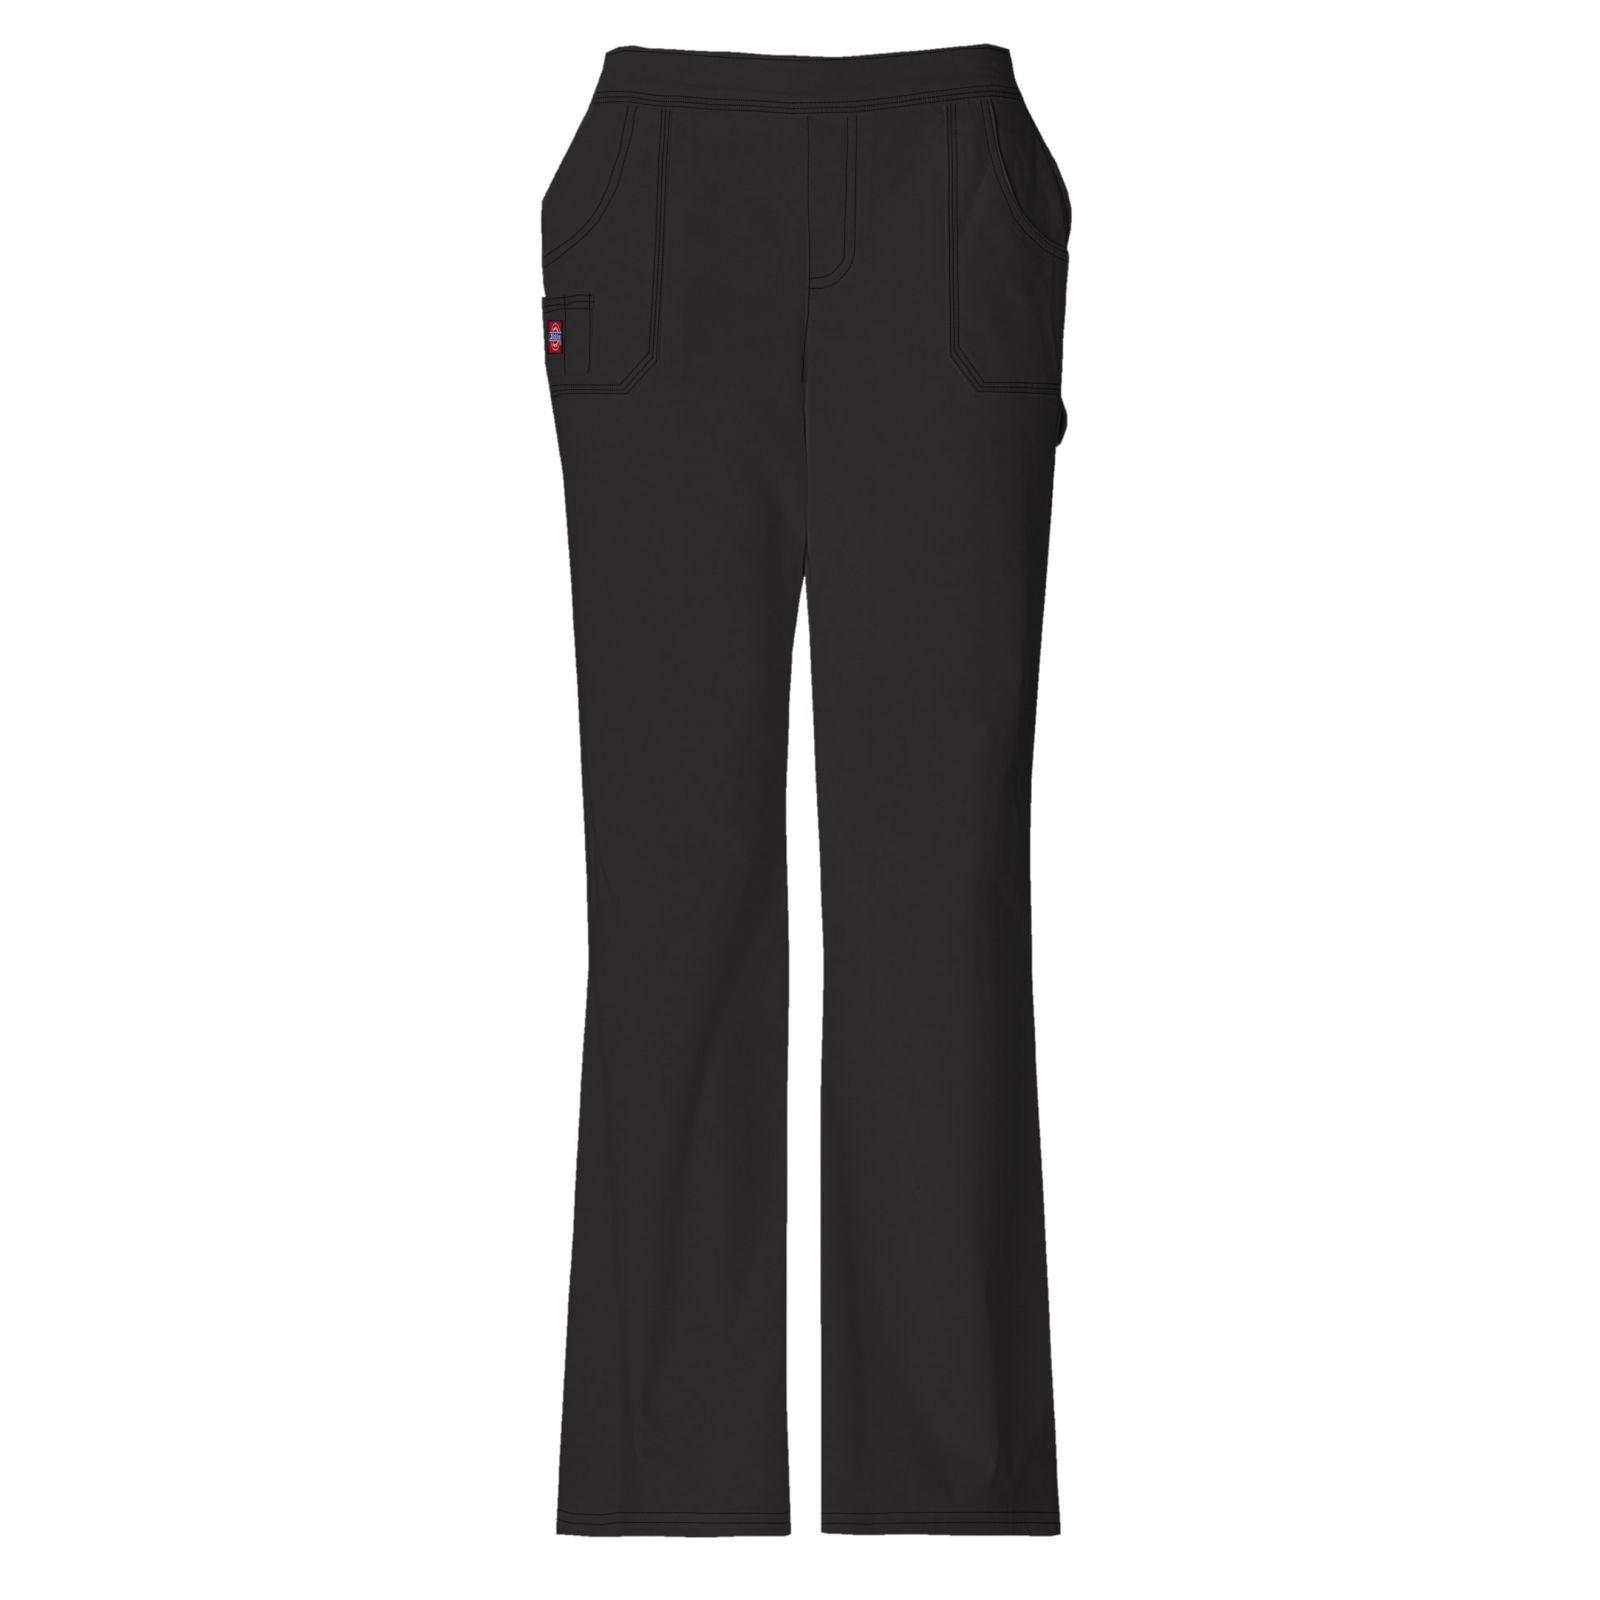 Pantalon Médical Femme Dickies, collection GenFlex (857355)